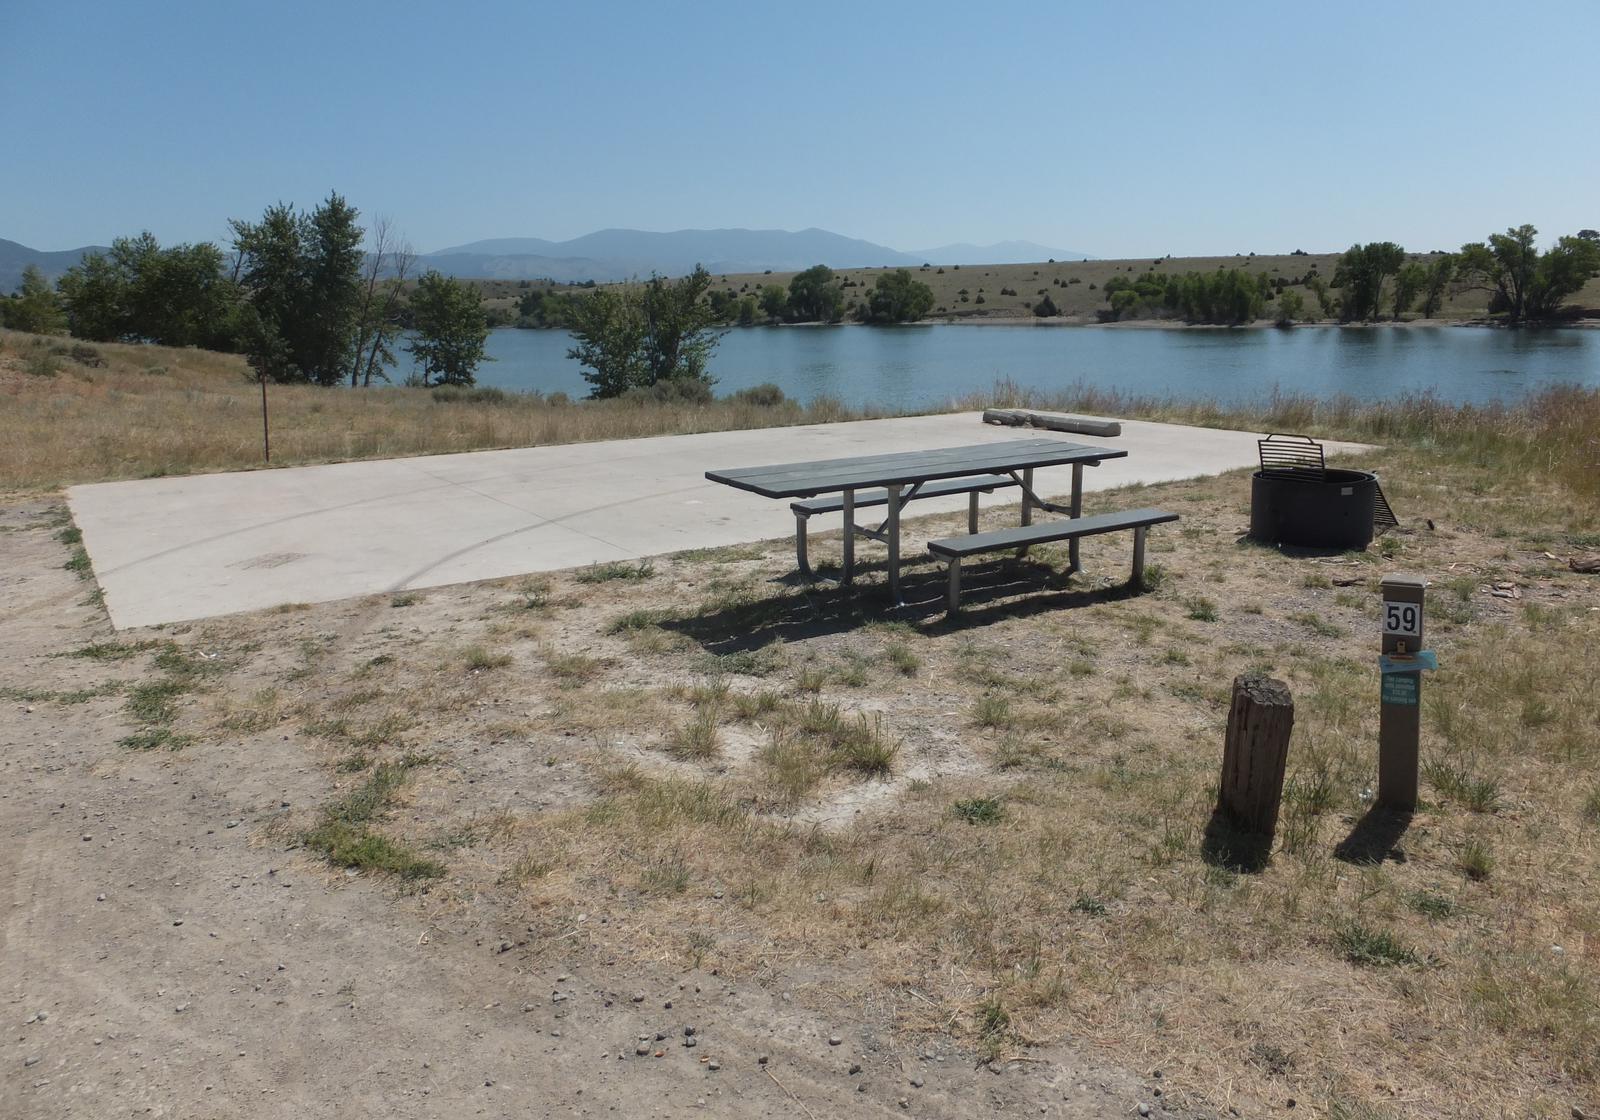 Hellgate Campground - Campsite 59